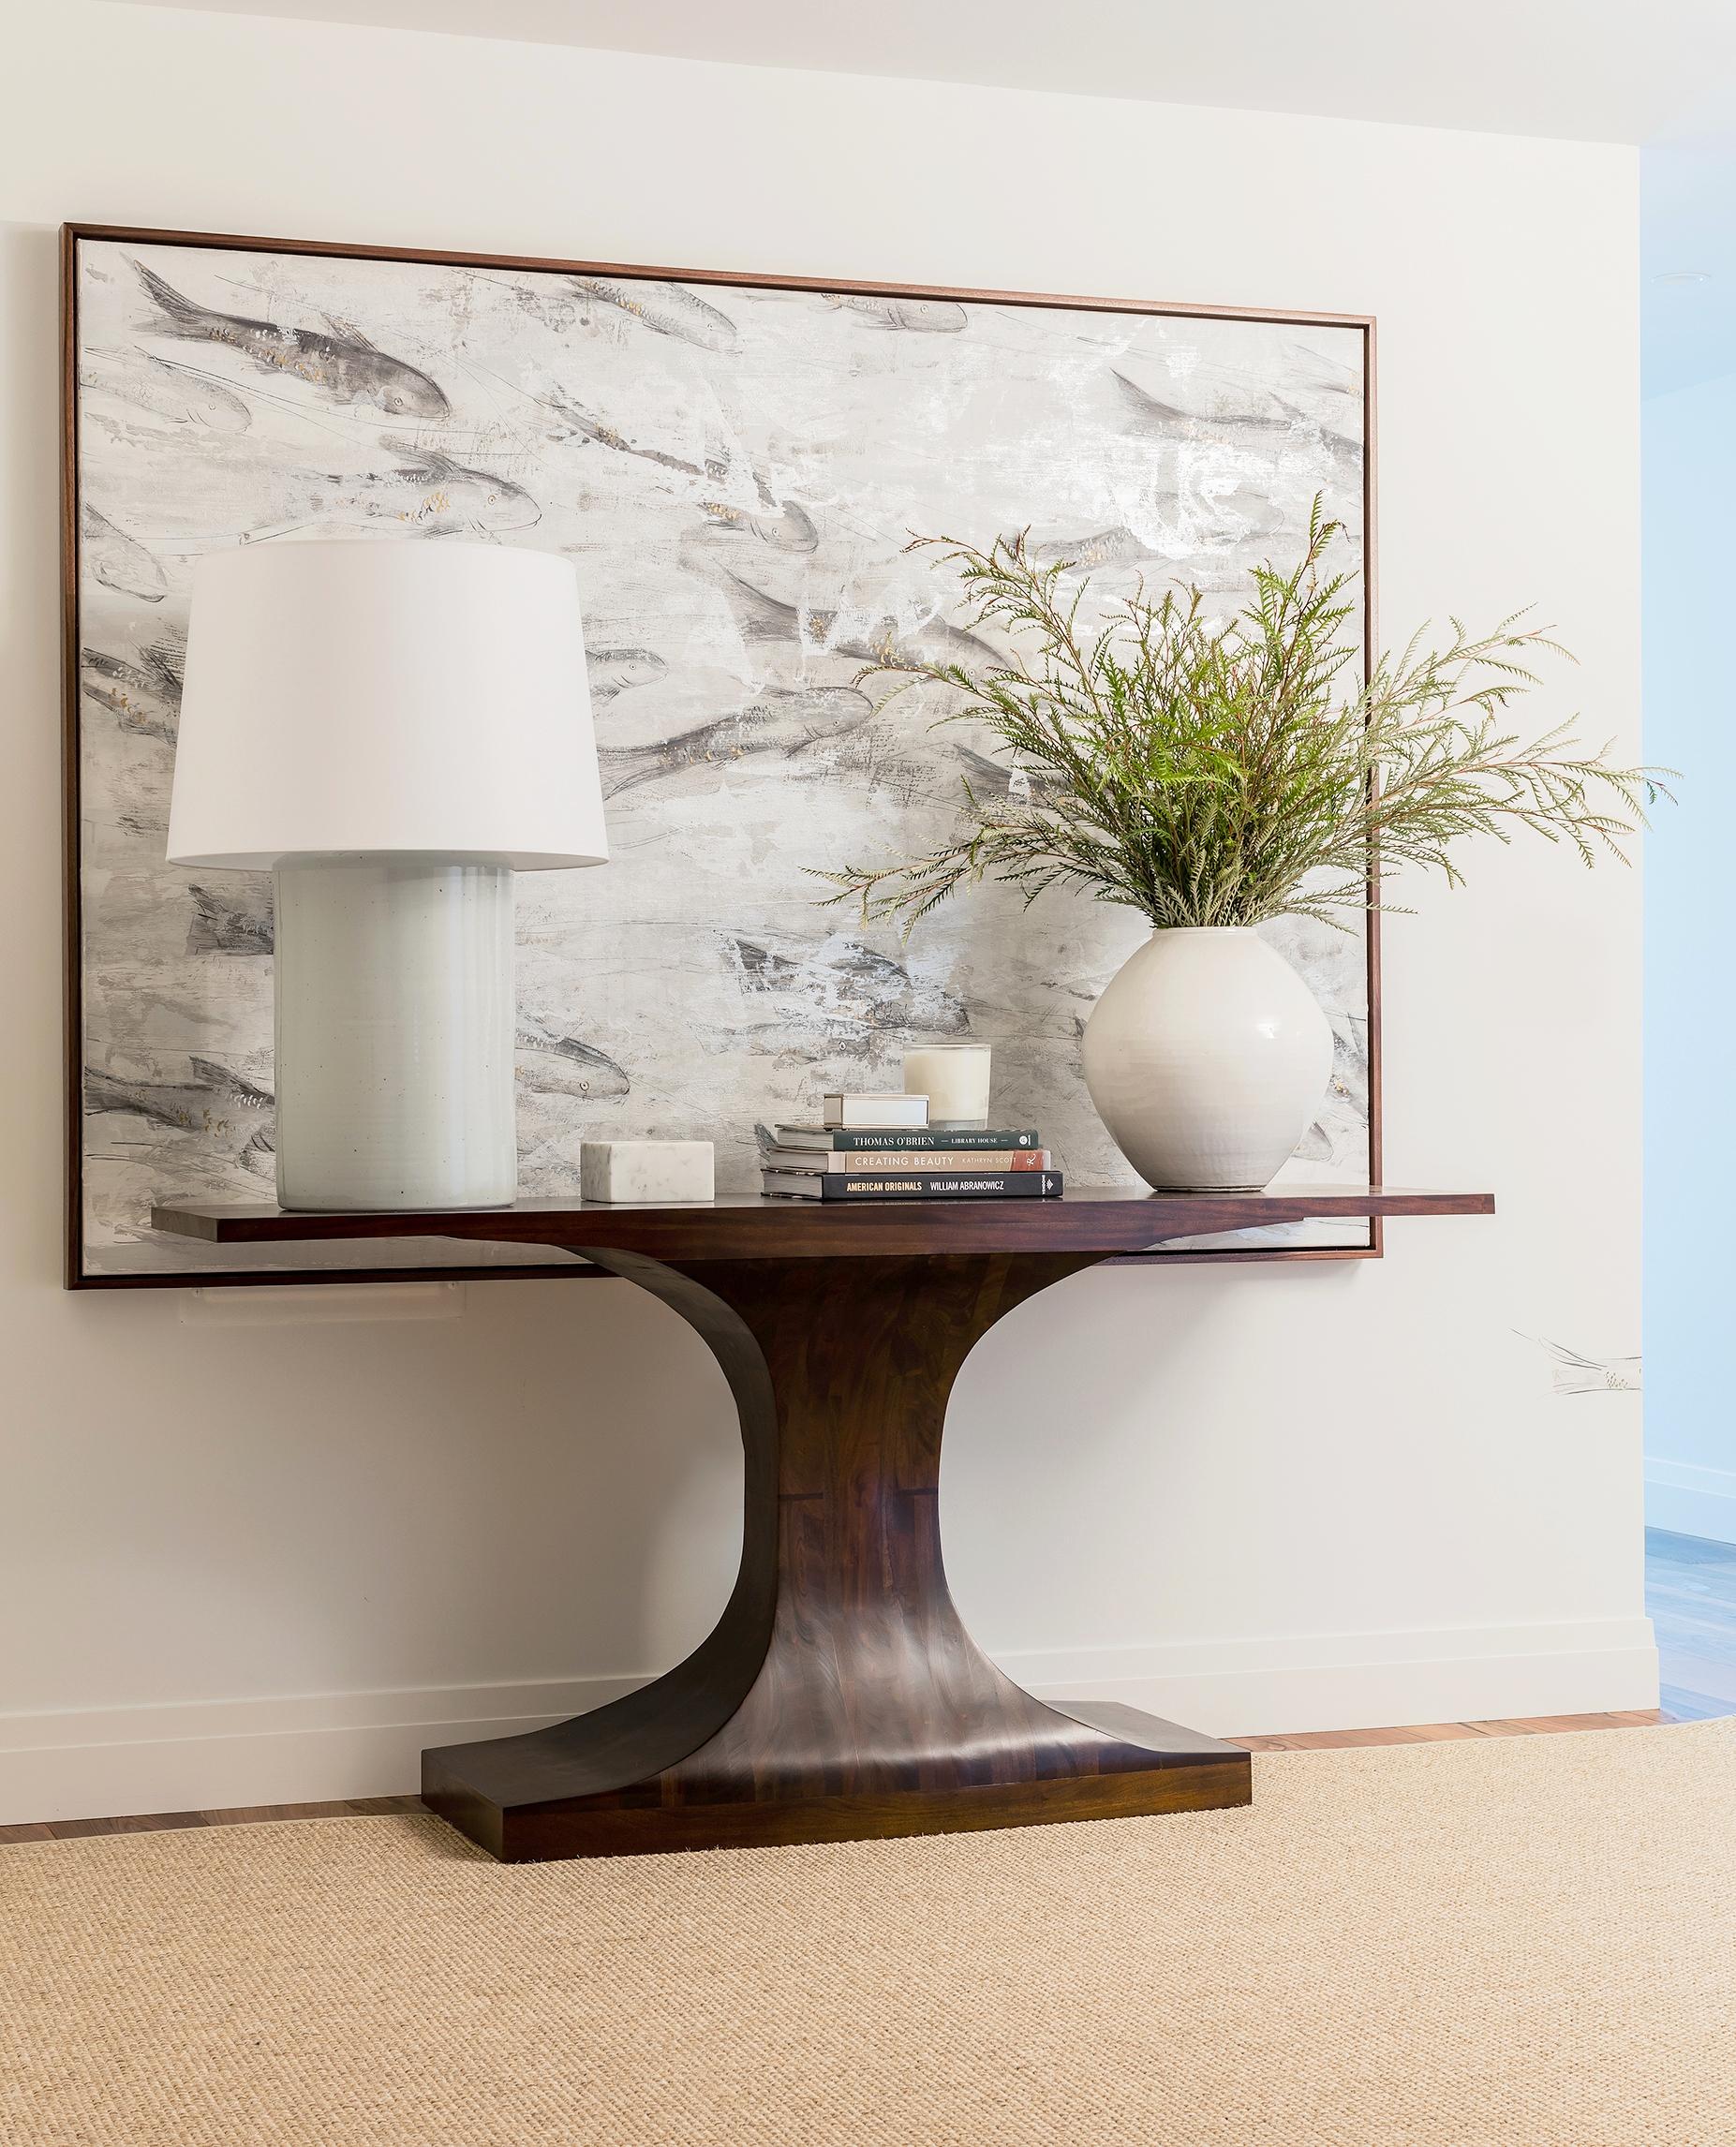 pier-4-model-foyer-console-hudson-interior-designs.jpg